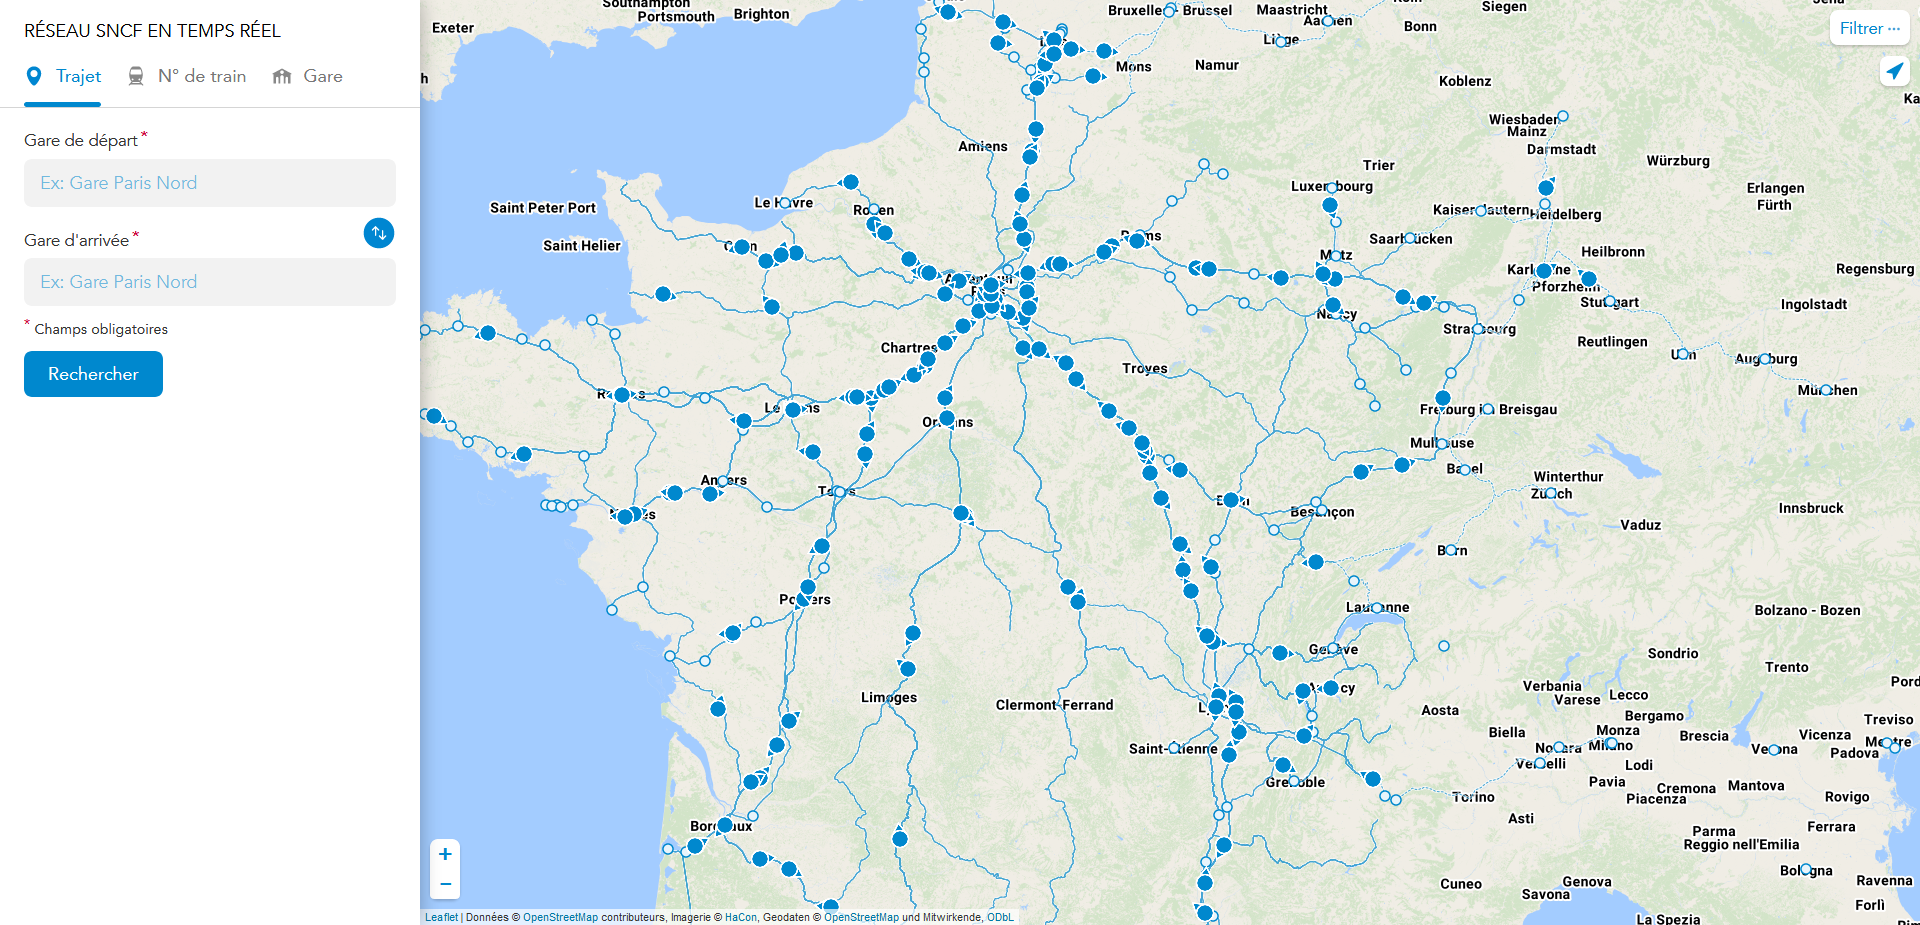 Французская железная дорога